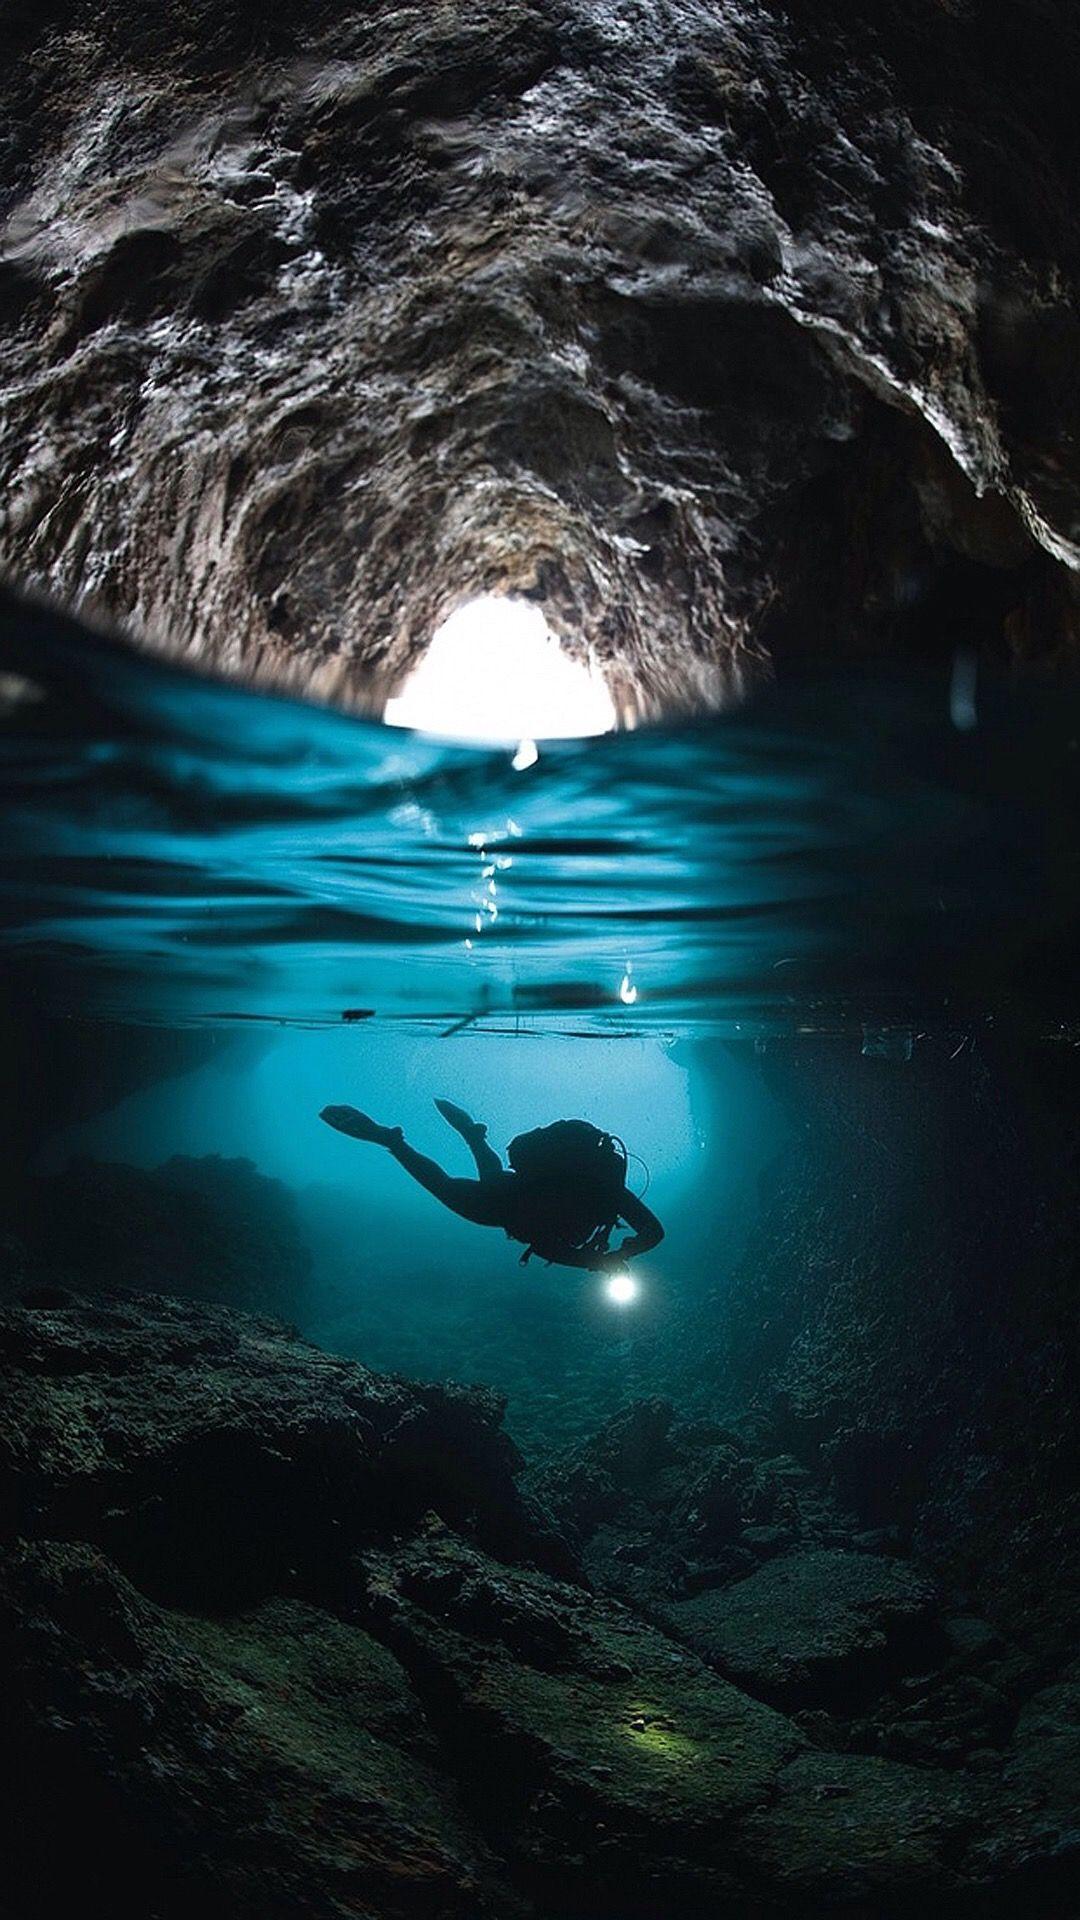 Beautiful Photos Underwater In The Sea